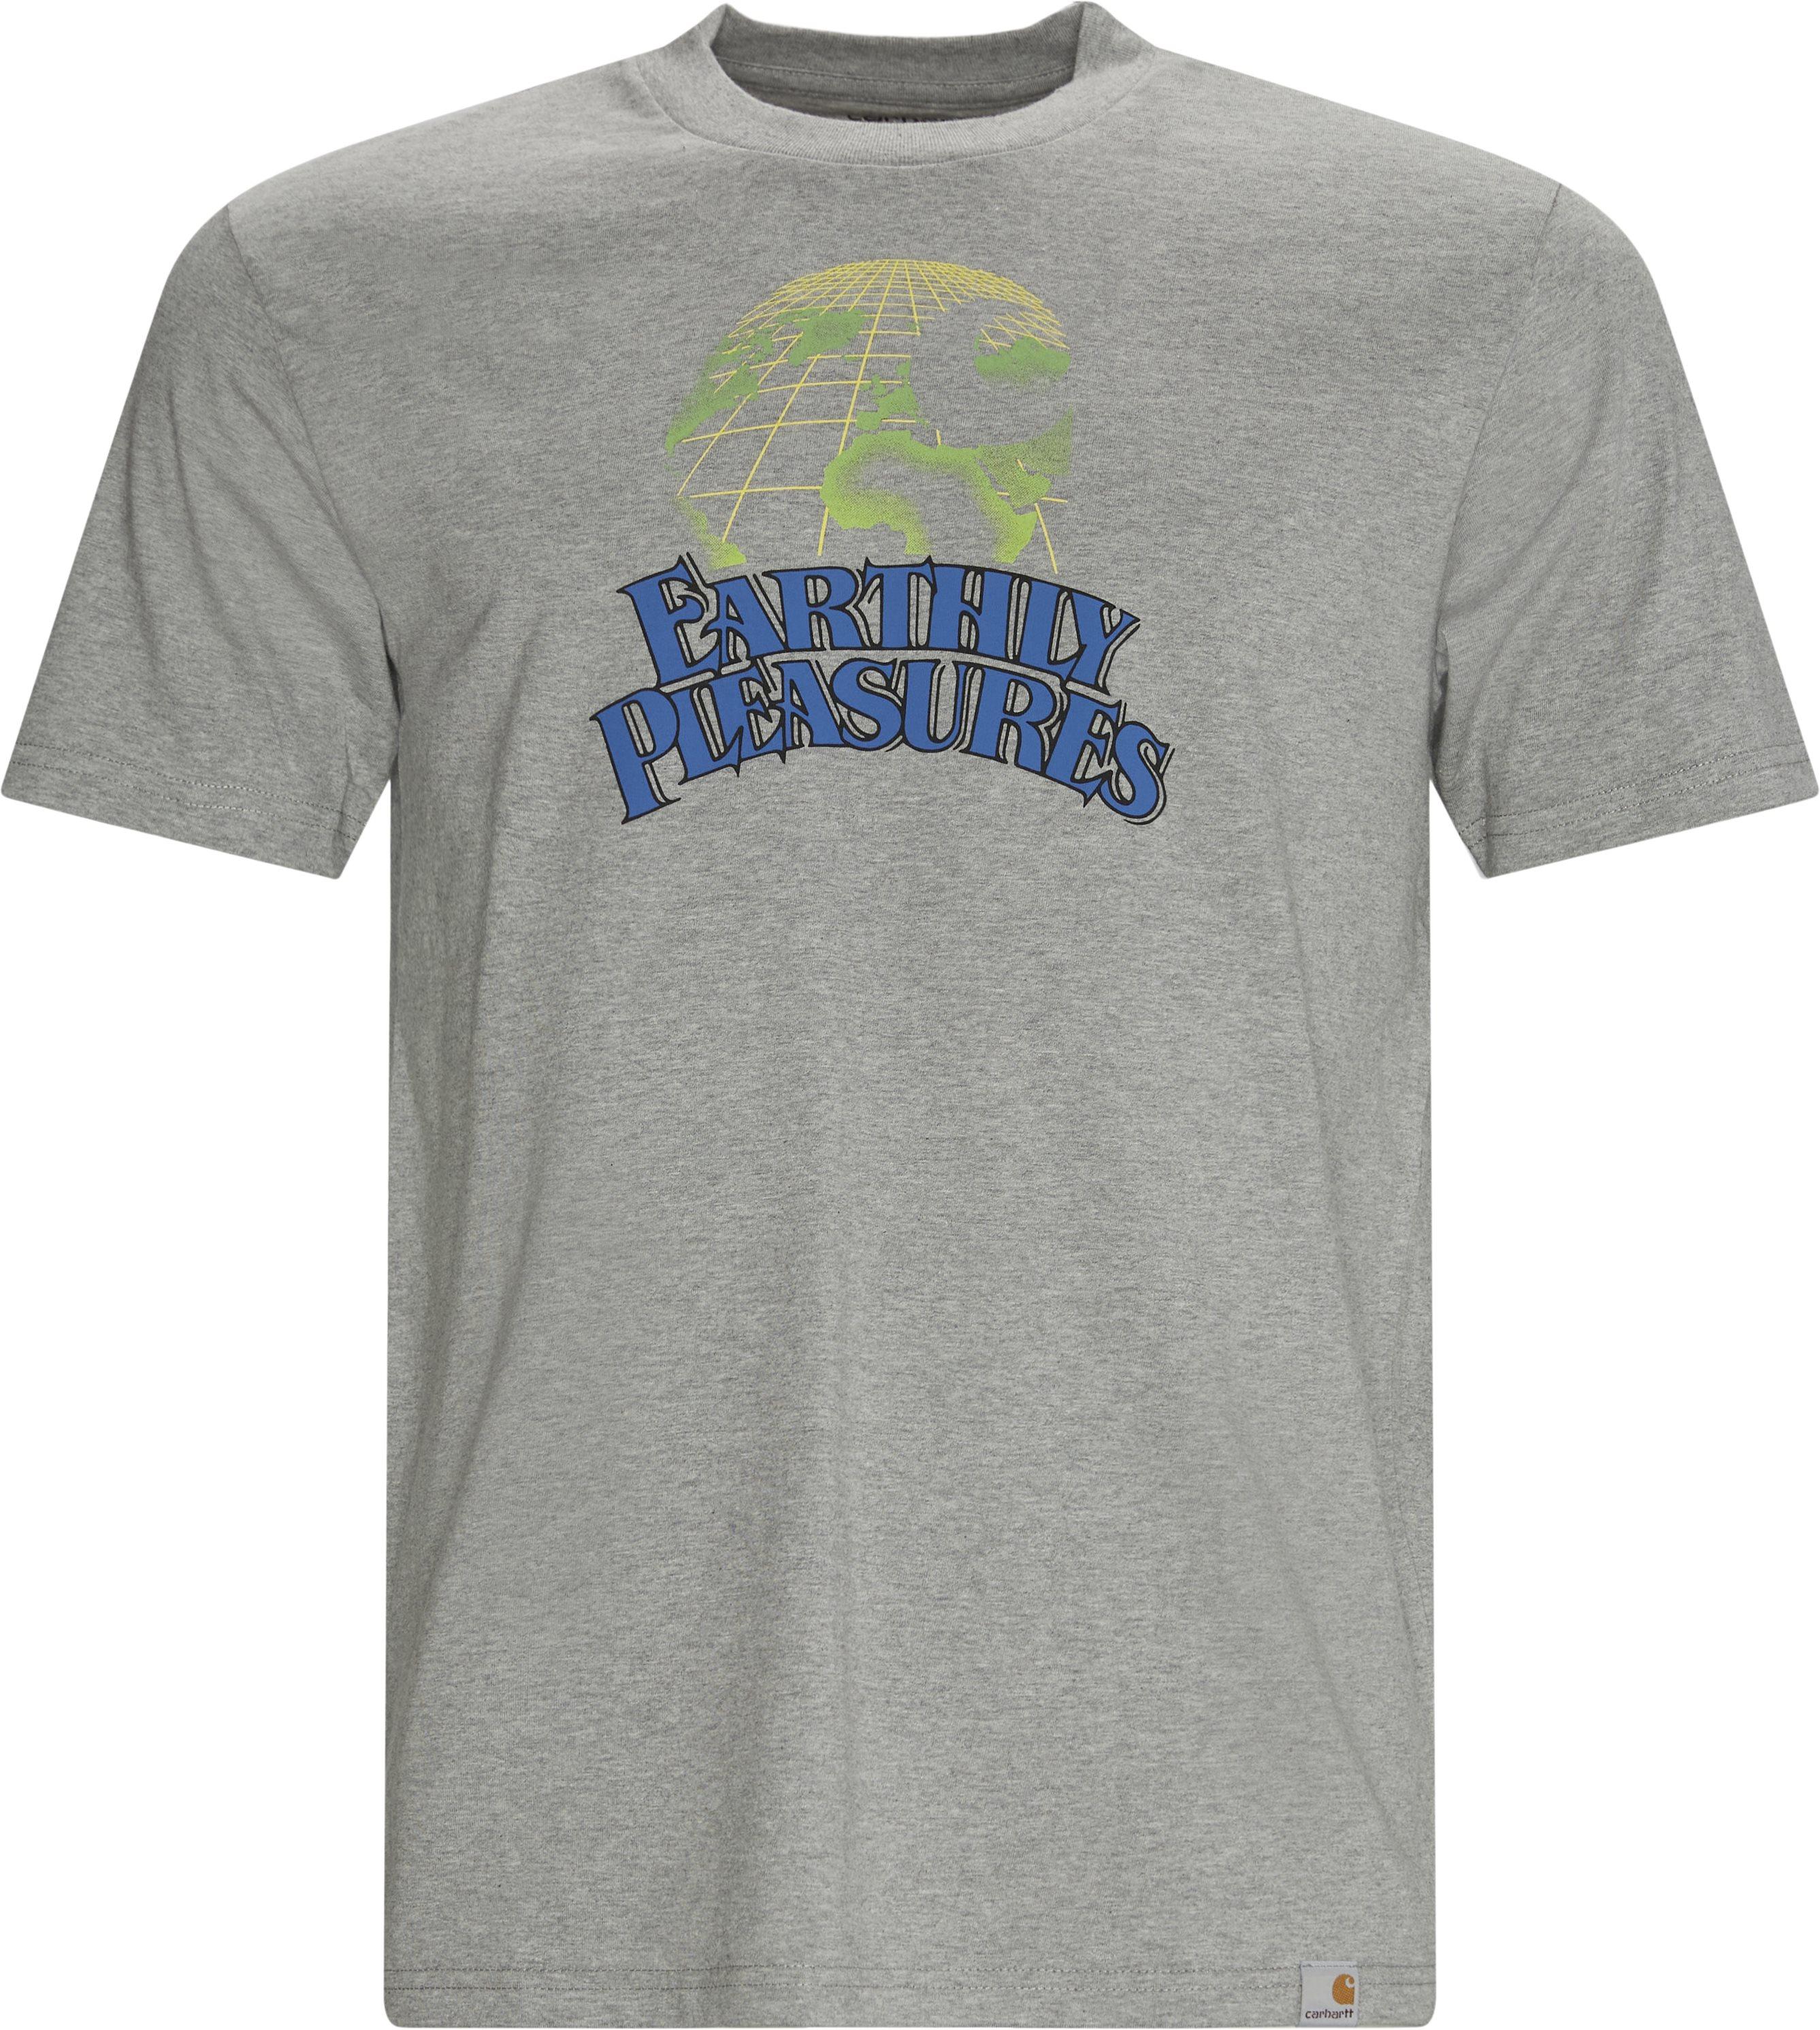 Earthly Pleasures Tee - T-shirts - Regular - Grey